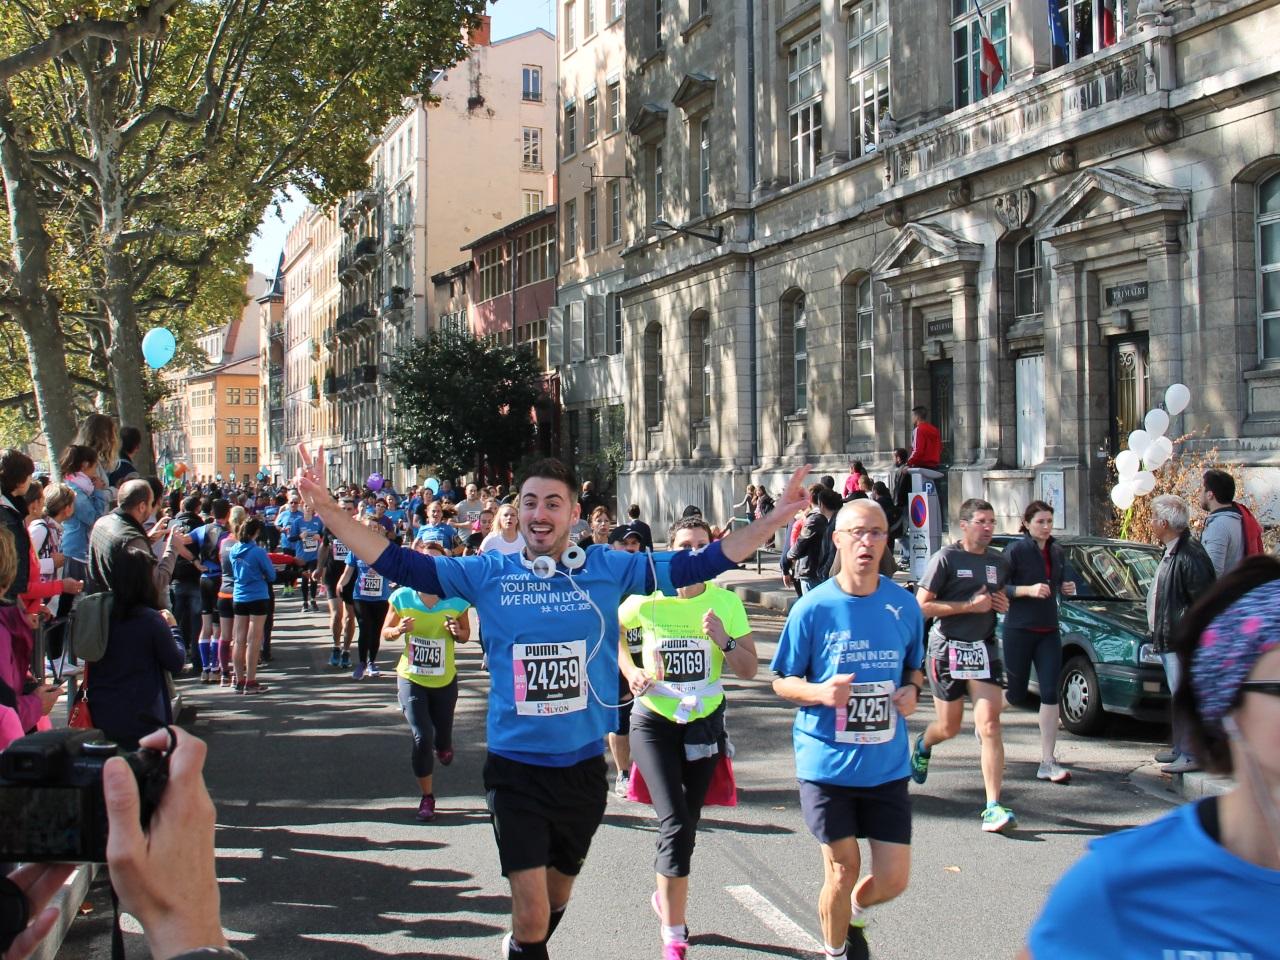 Le Run in Lyon édition 2015 - LyonMag